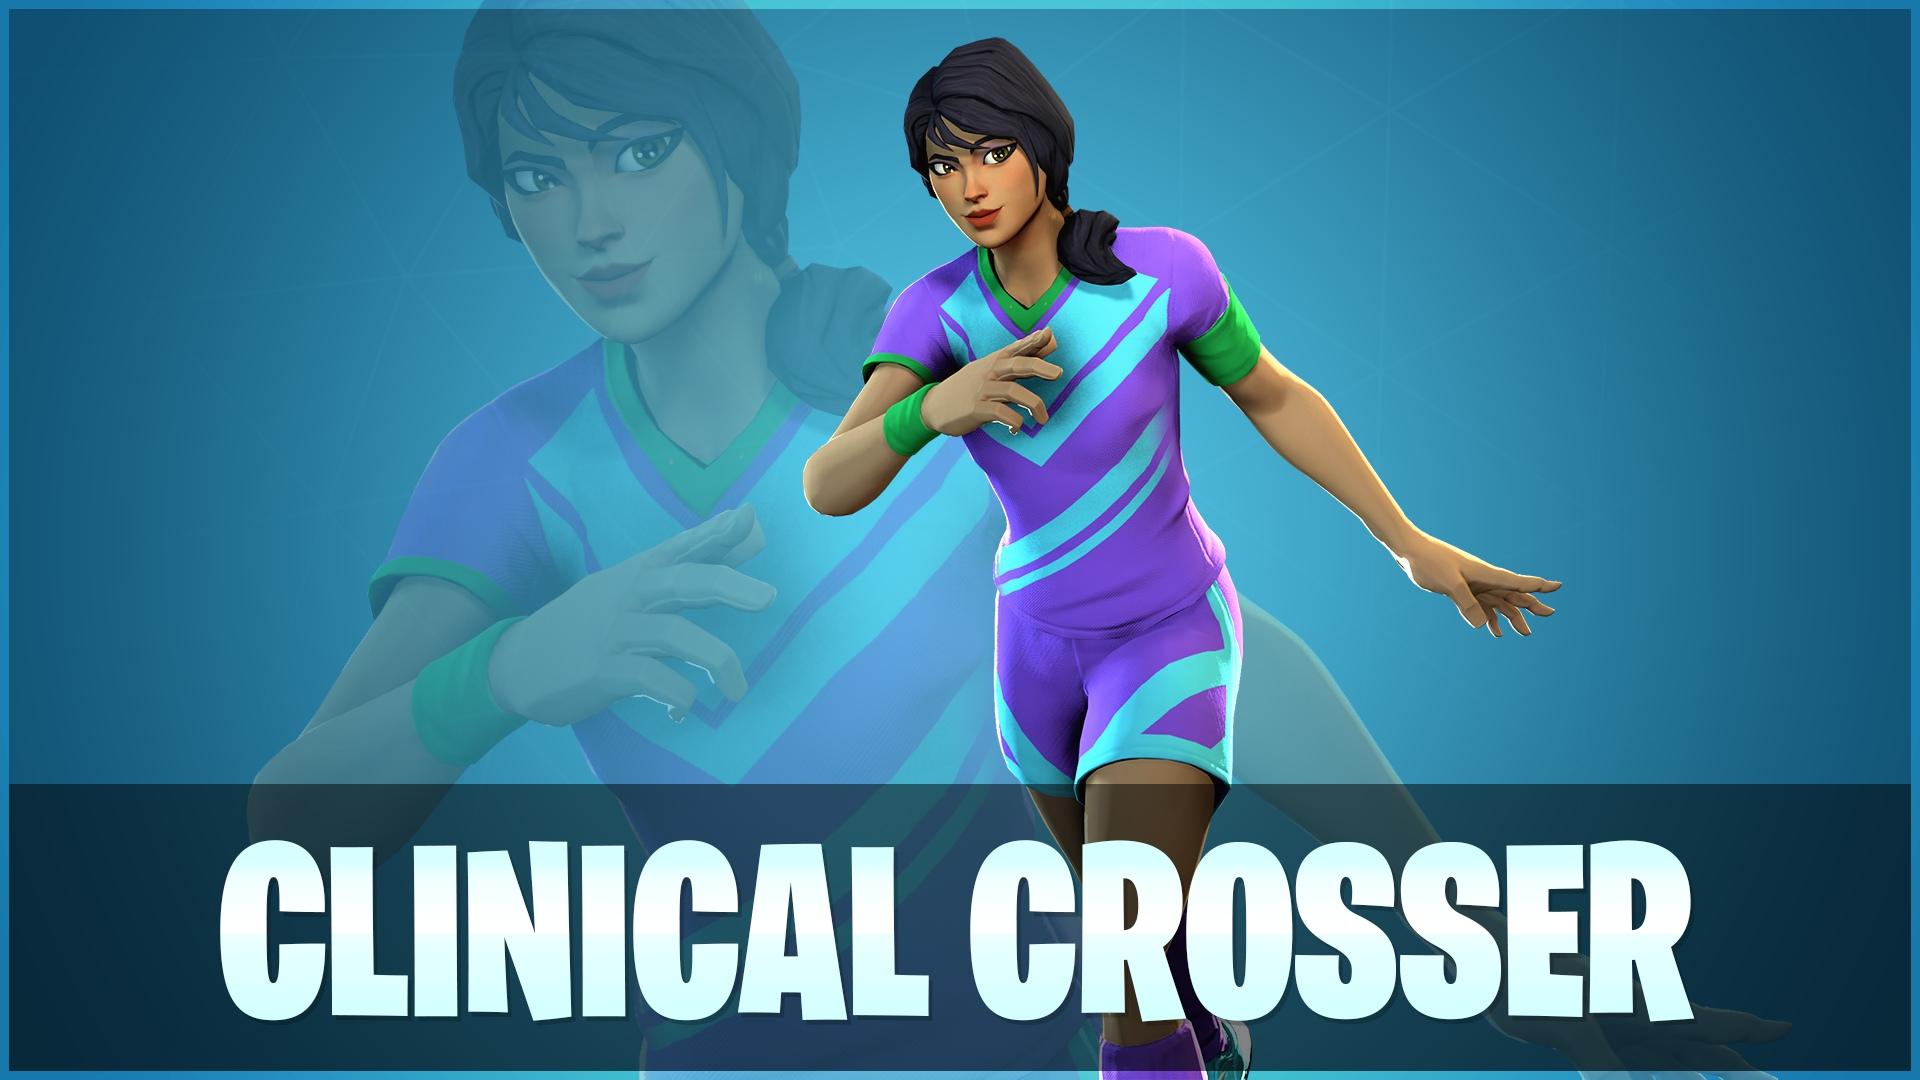 Steam Workshop [FORTNITE] Clinical Crosser 1920x1080